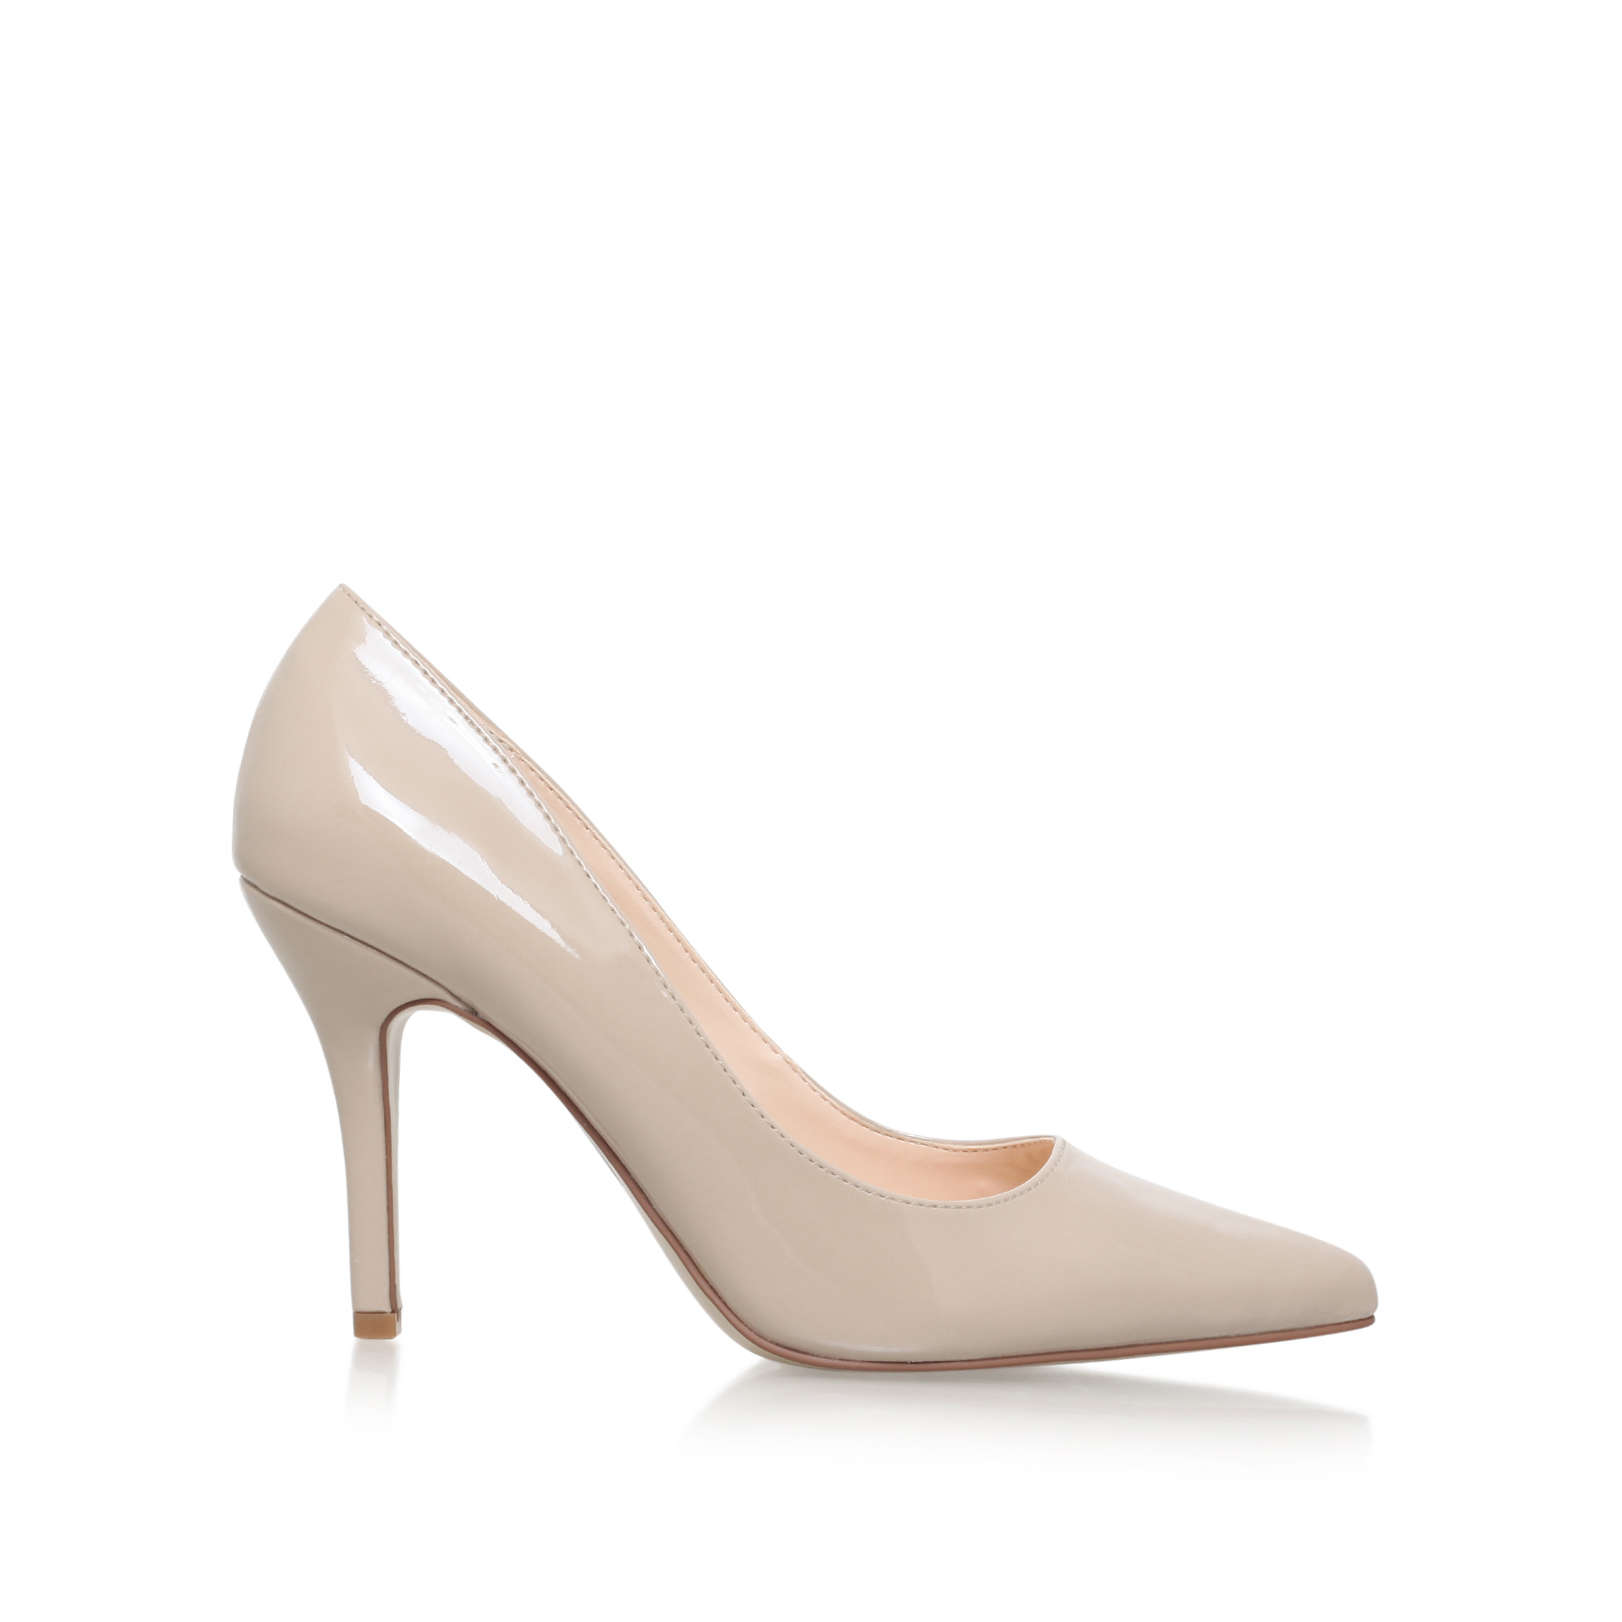 Nine West Flagship Court Shoes